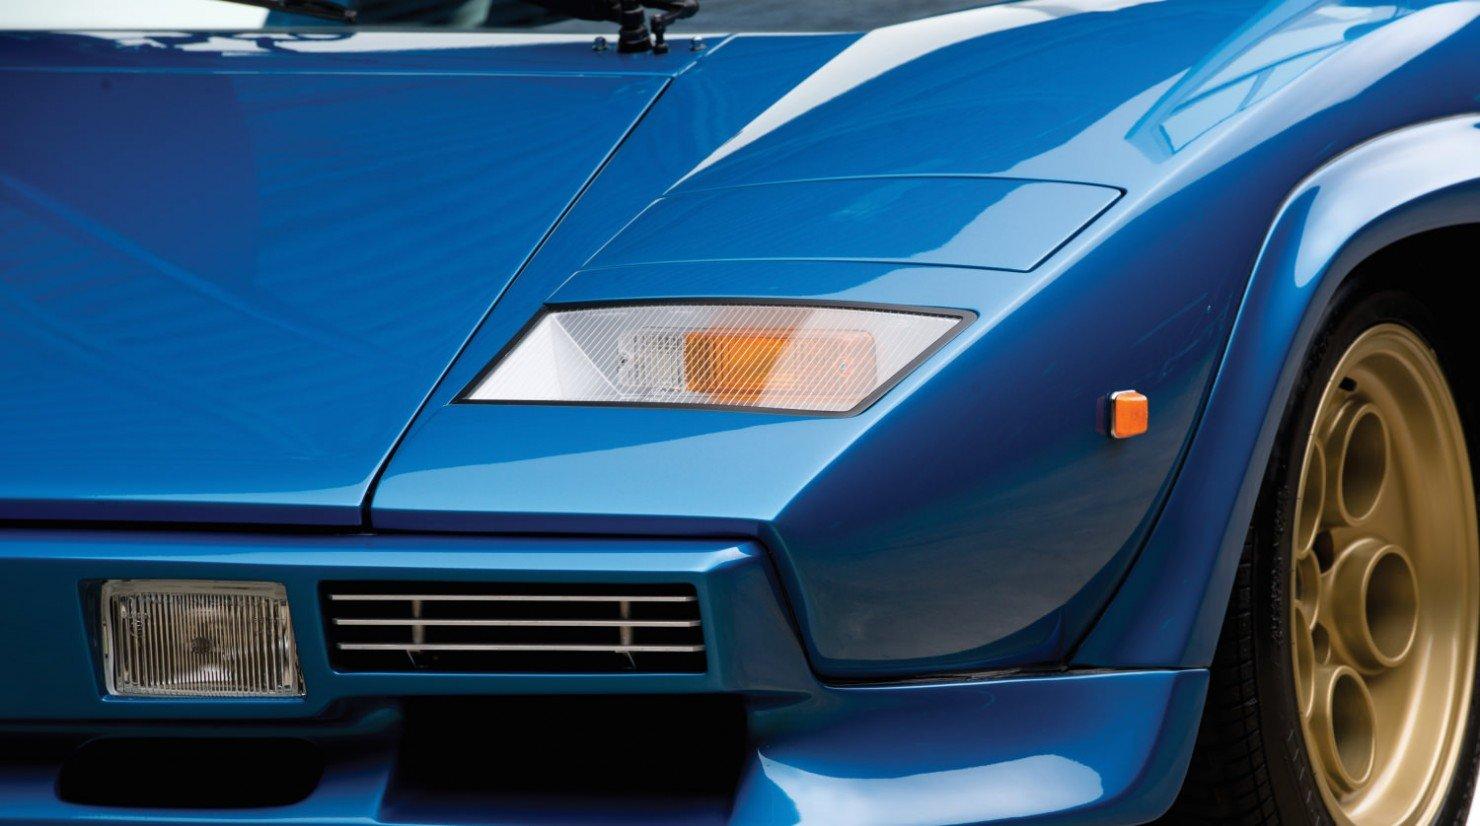 Lamborghini-Countach-LP400S-10